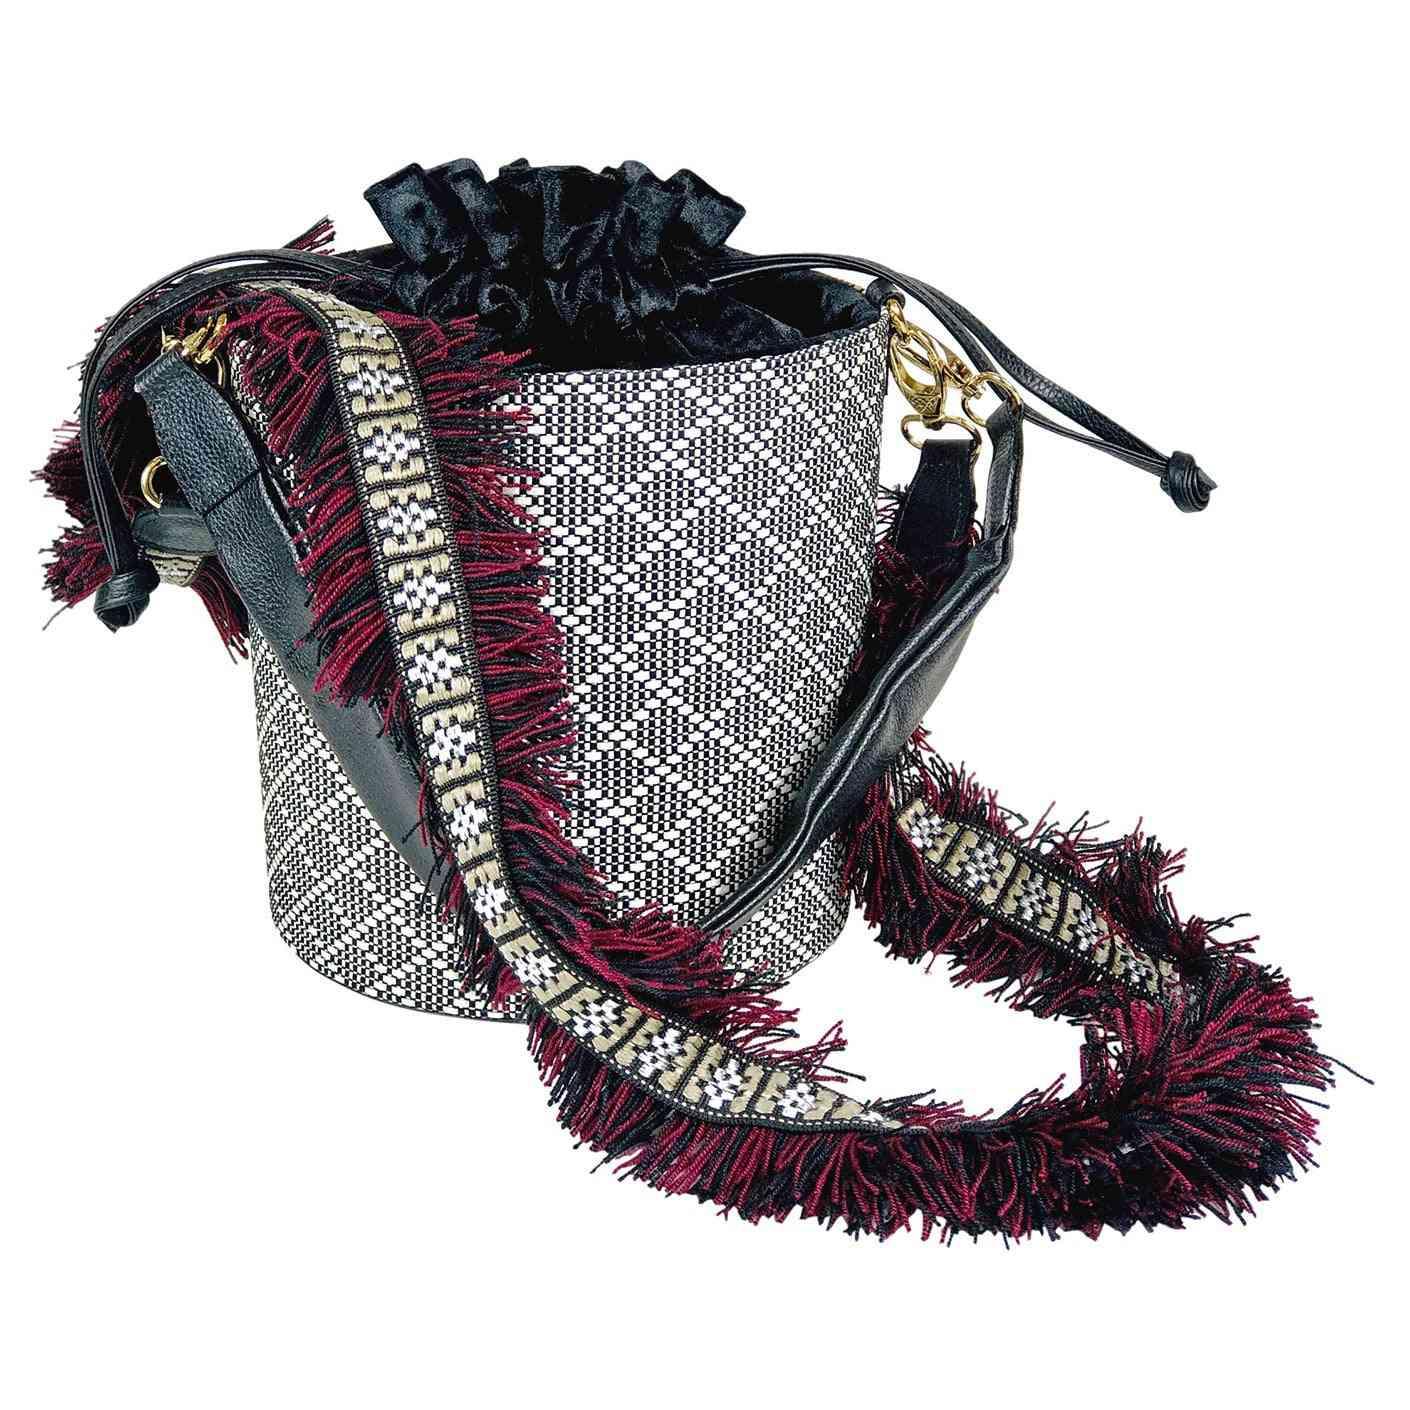 Earthy Tone Handcrafted Handbag